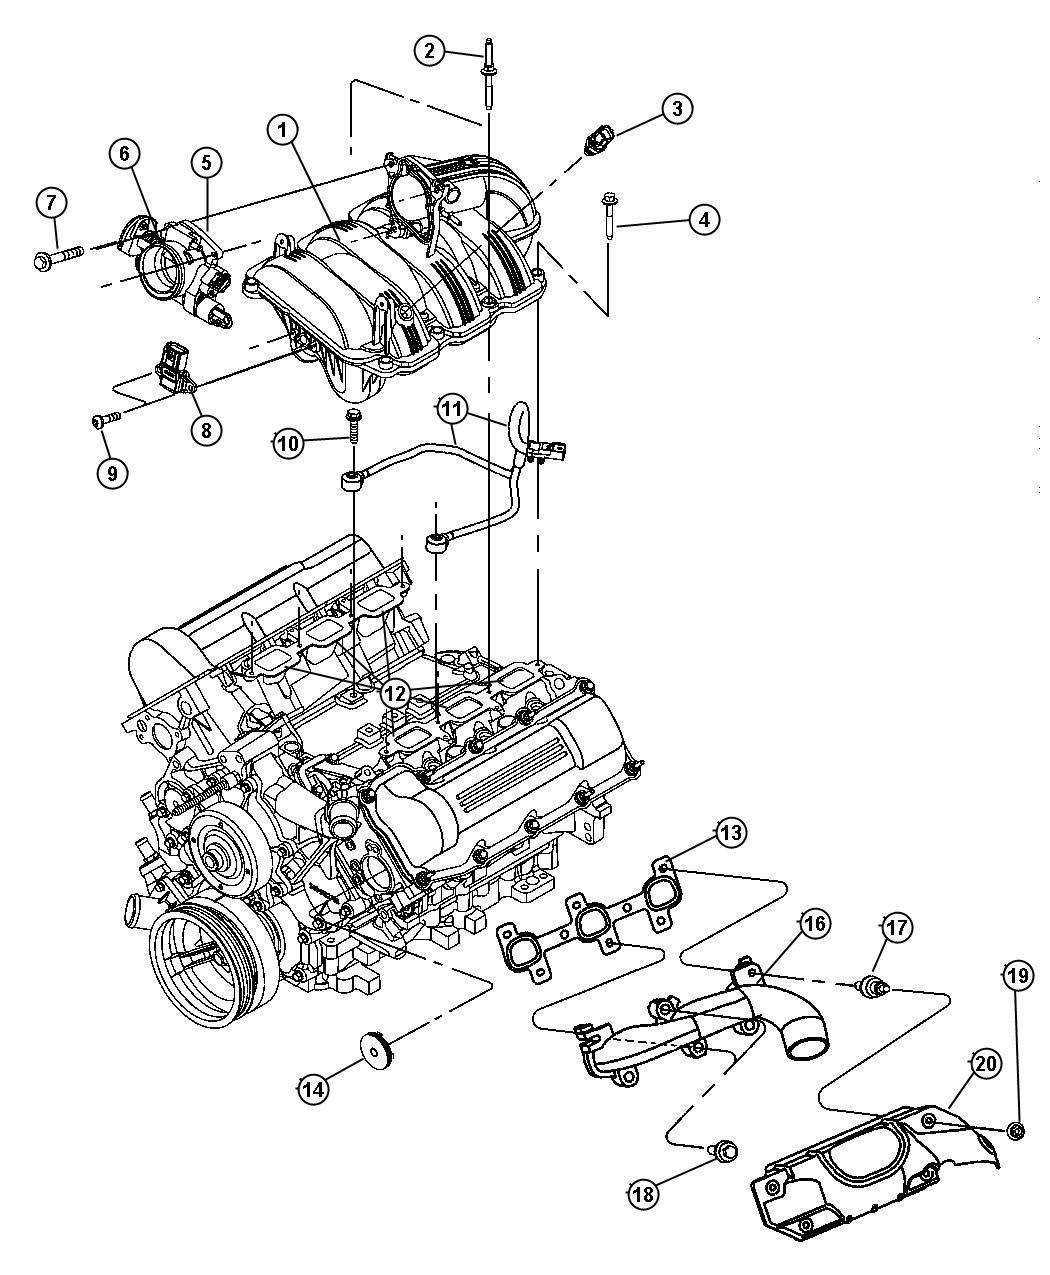 Jeep engine diagram jeep wiring diagrams